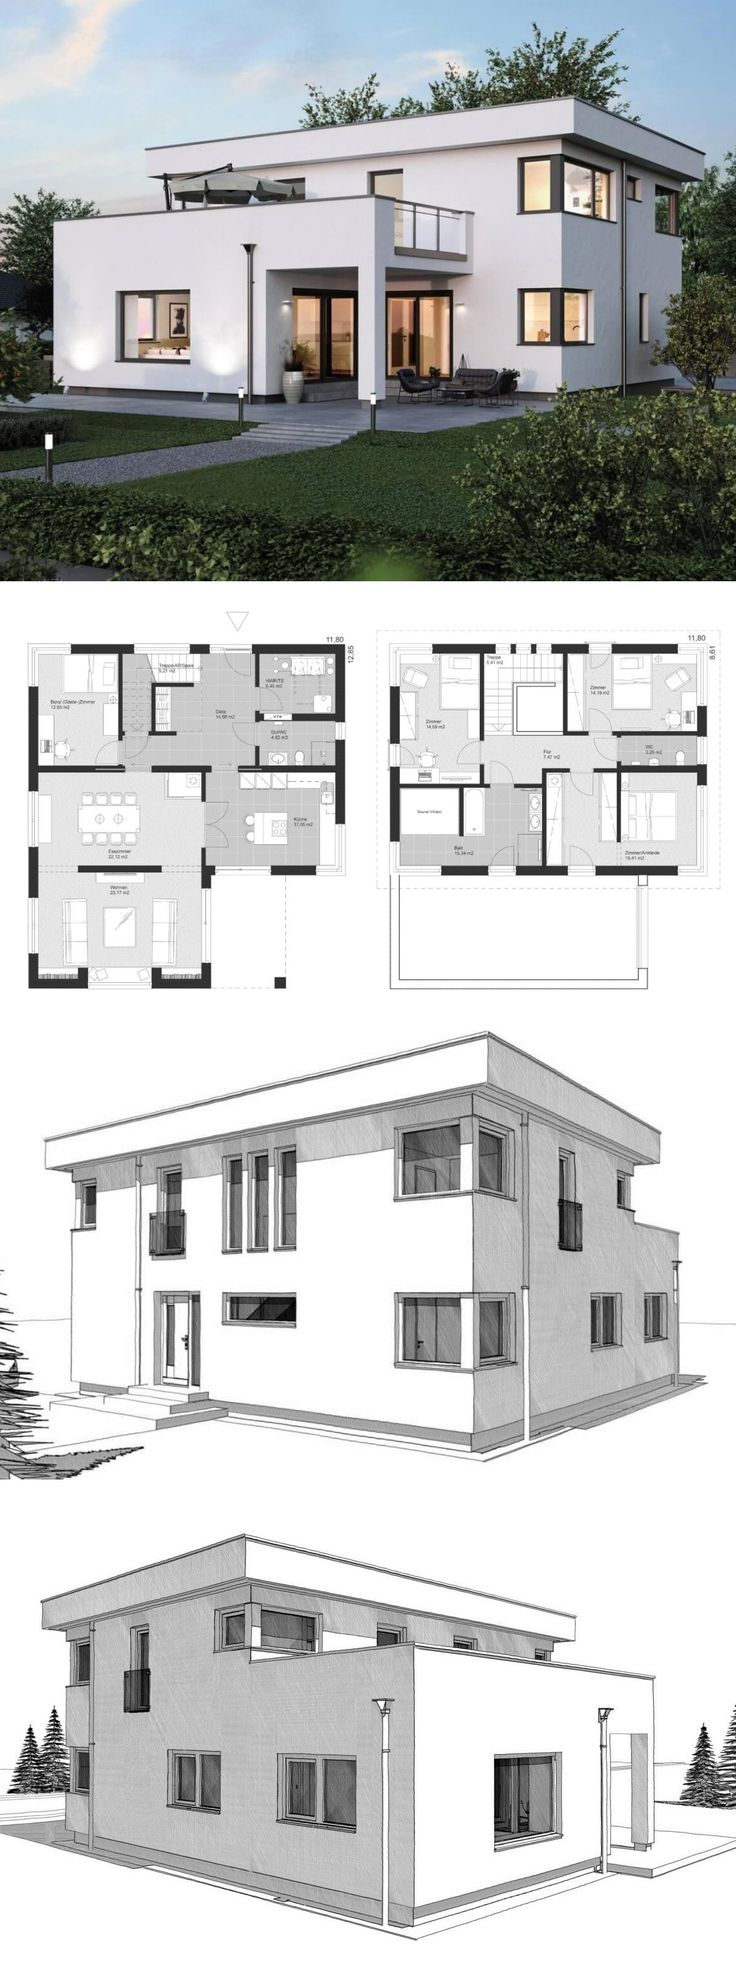 Bauhaus Stadtvilla Grundriss modern mit Flachdach …